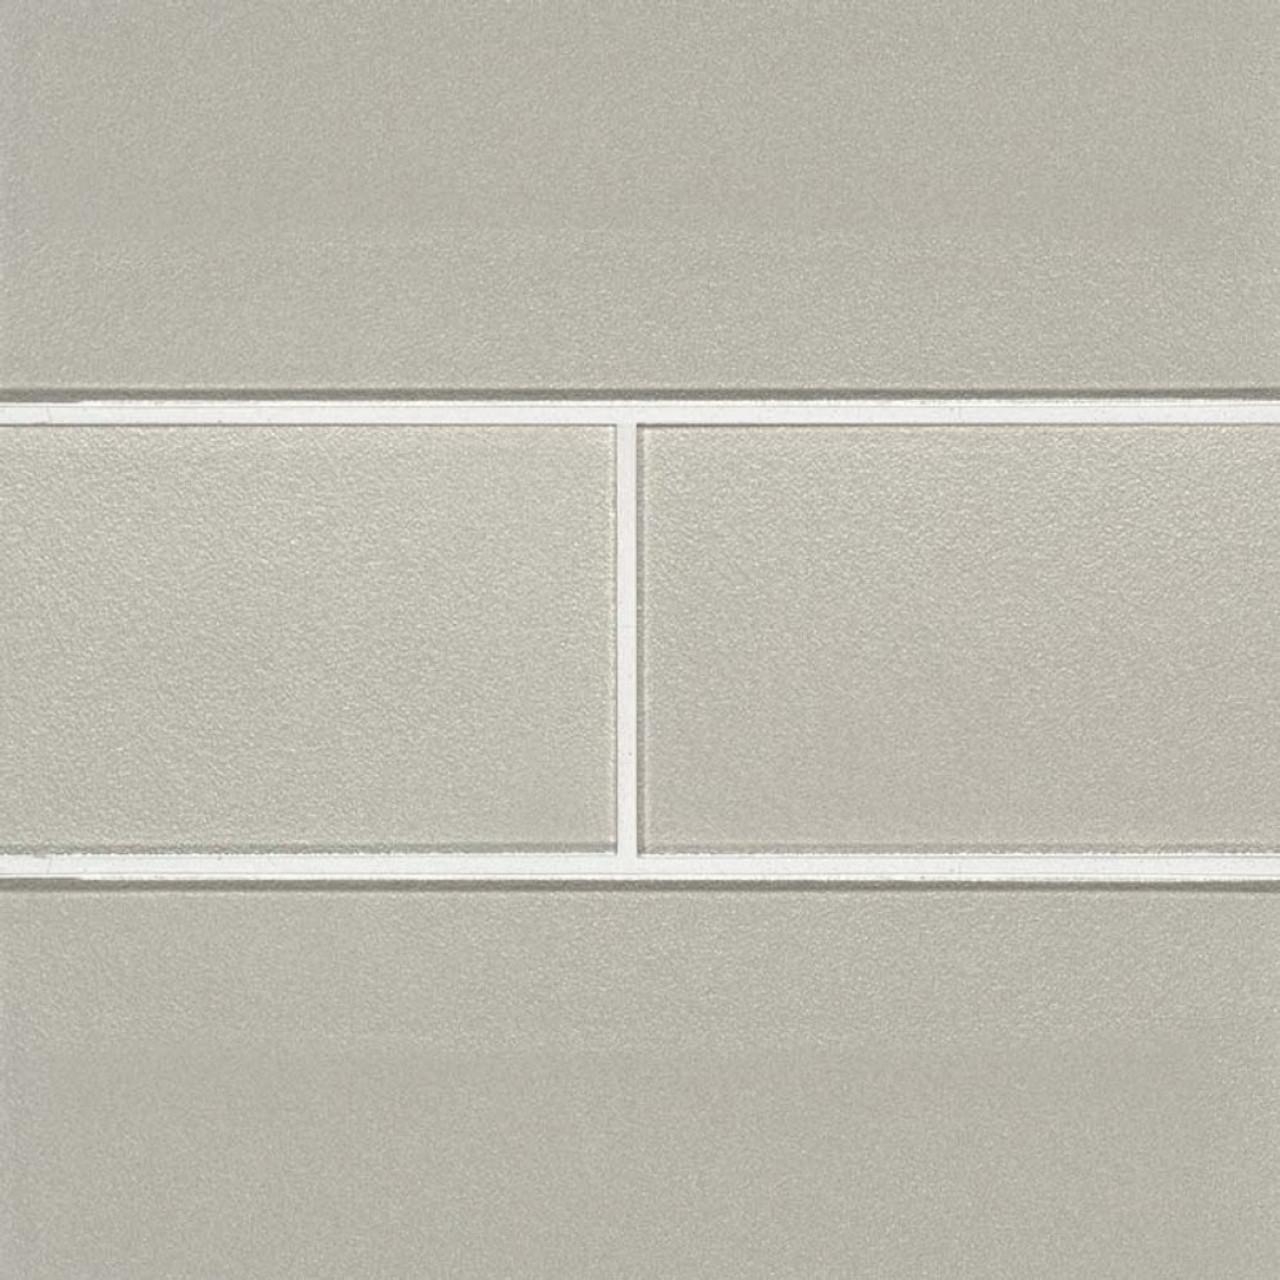 ms international backsplash series starlight 4x12 glass subway wall tile smot gl t strlt412